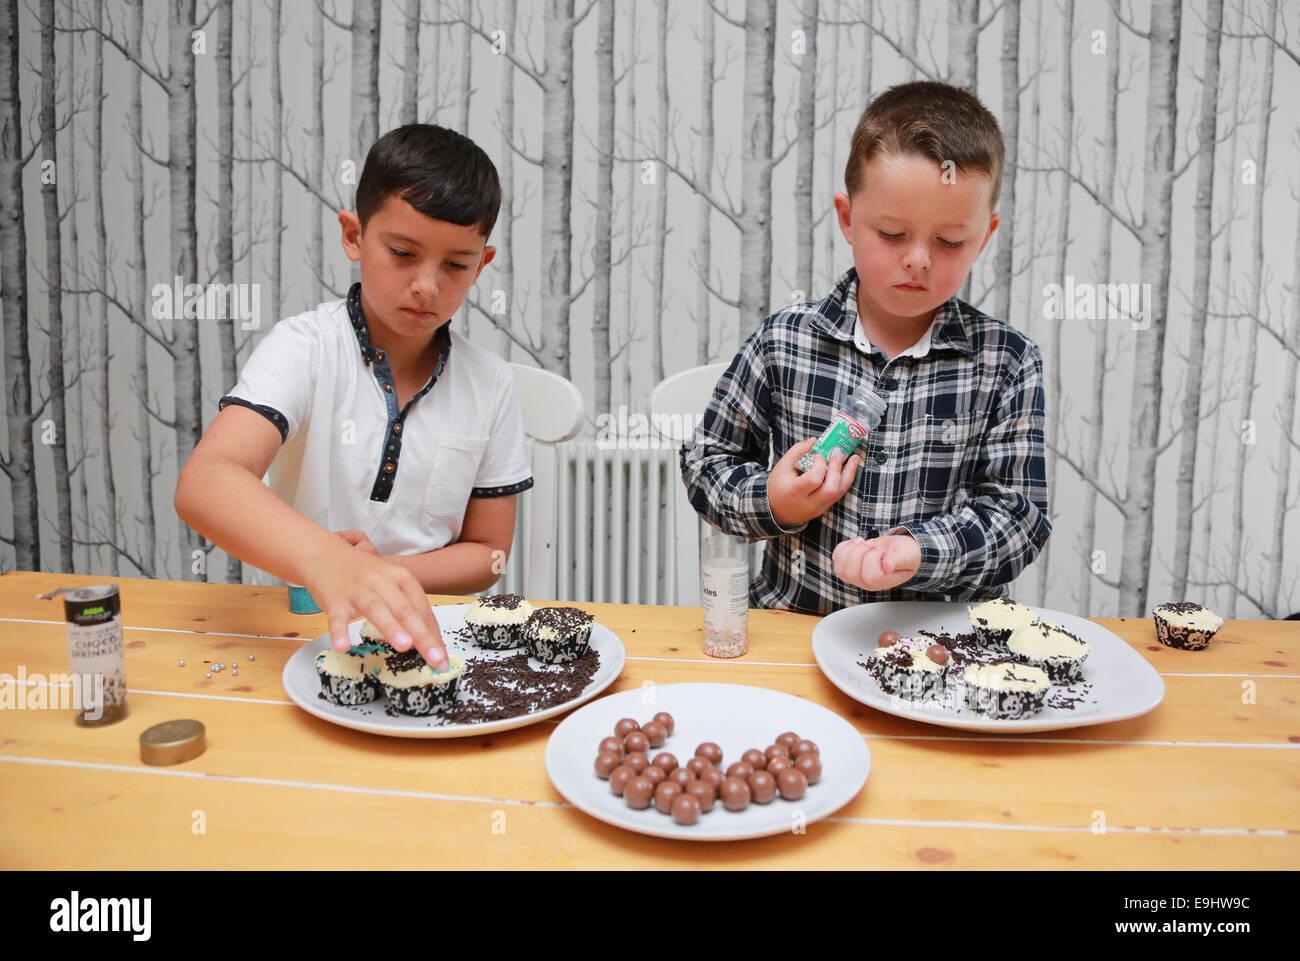 Children decorating cakes Stock Photo